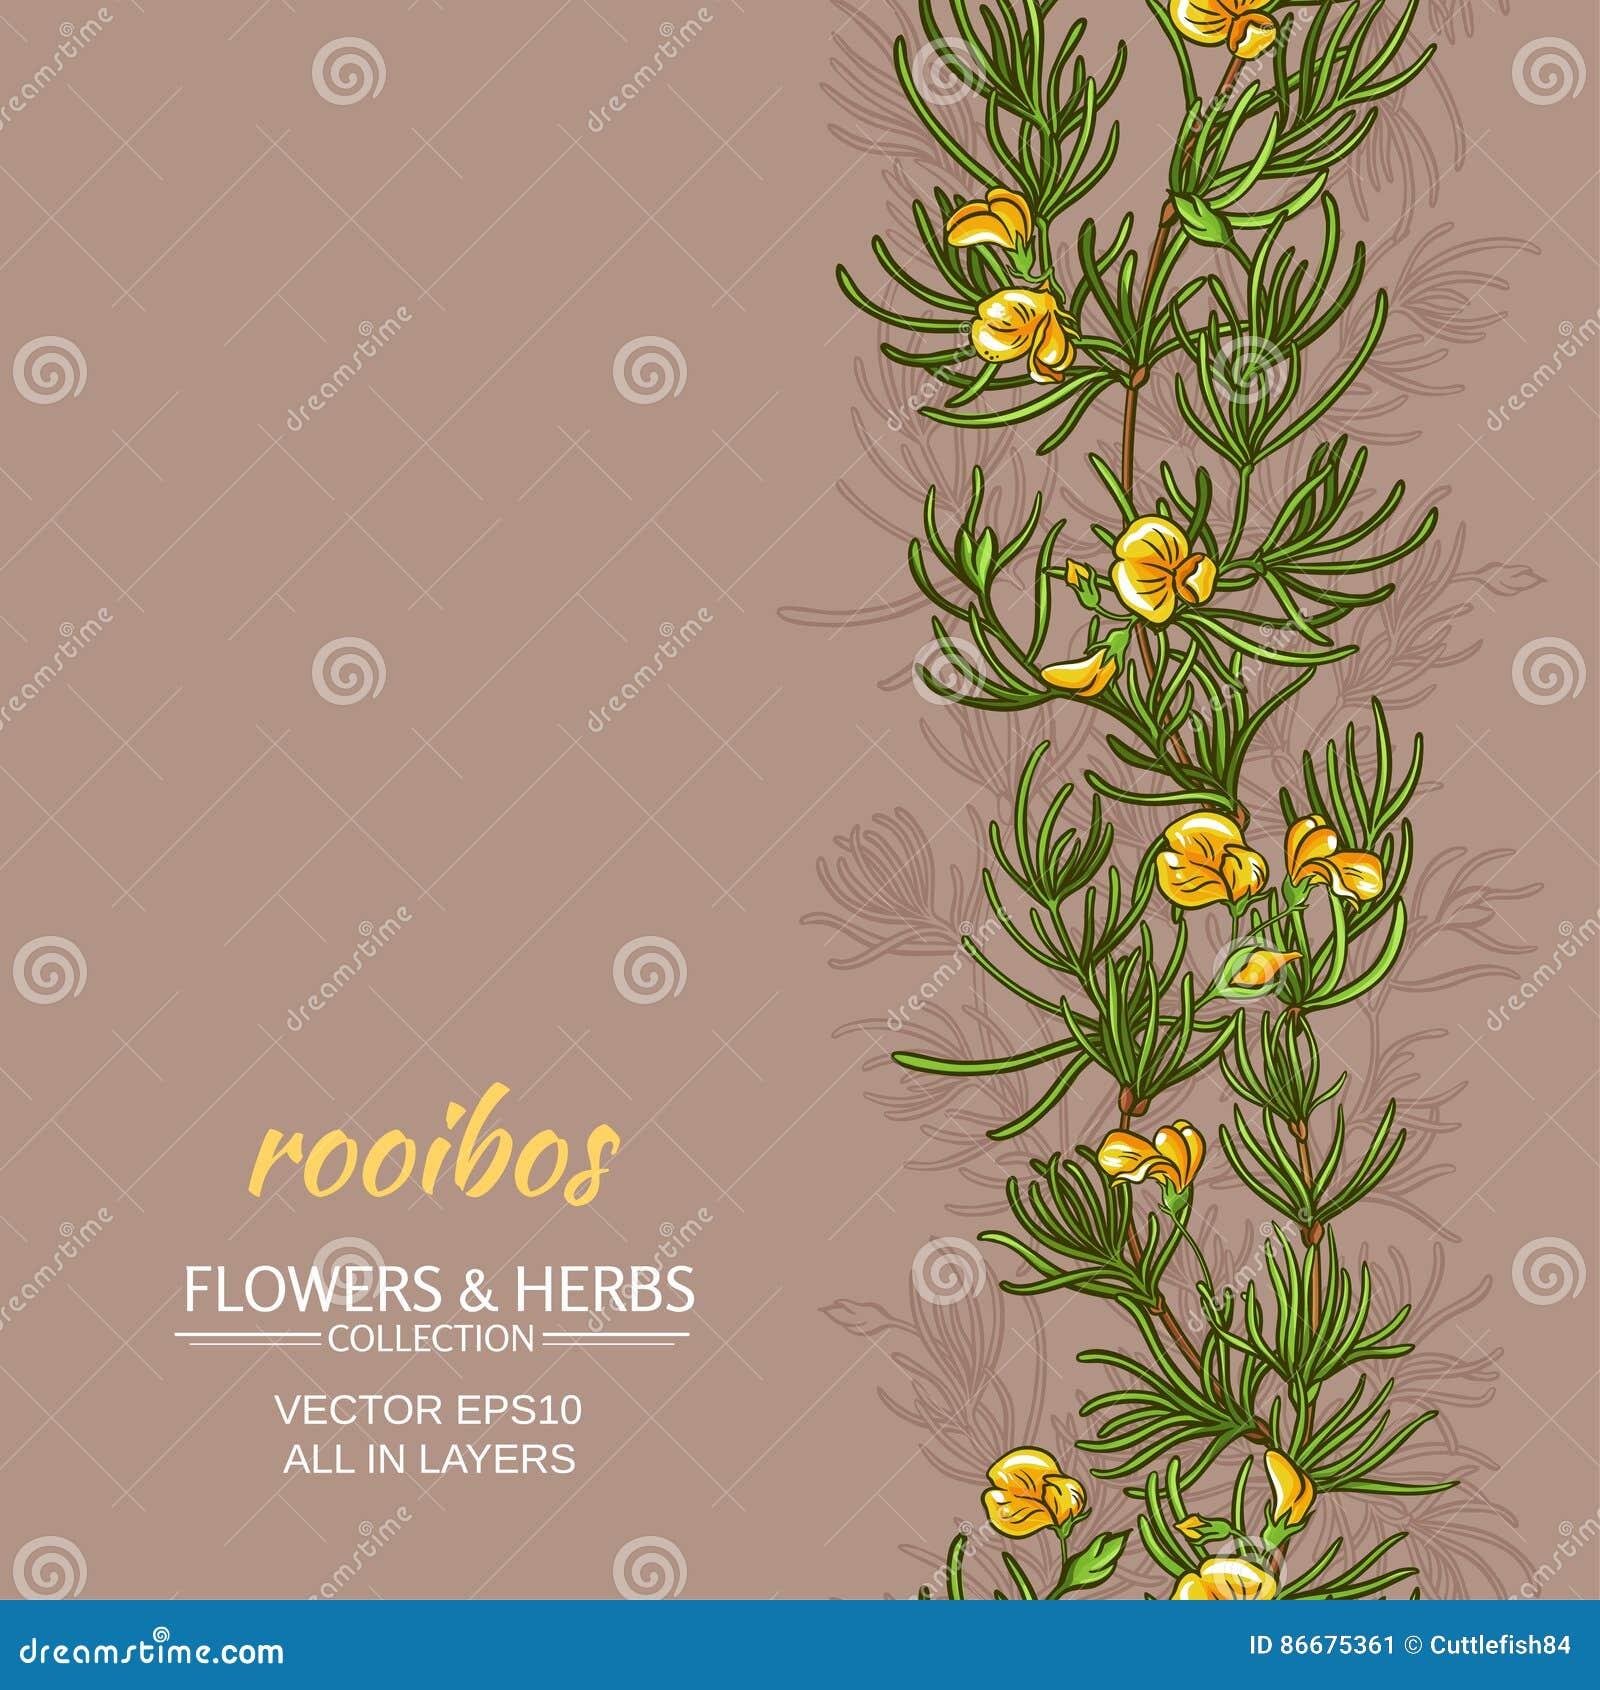 Rooibos vektorbakgrund